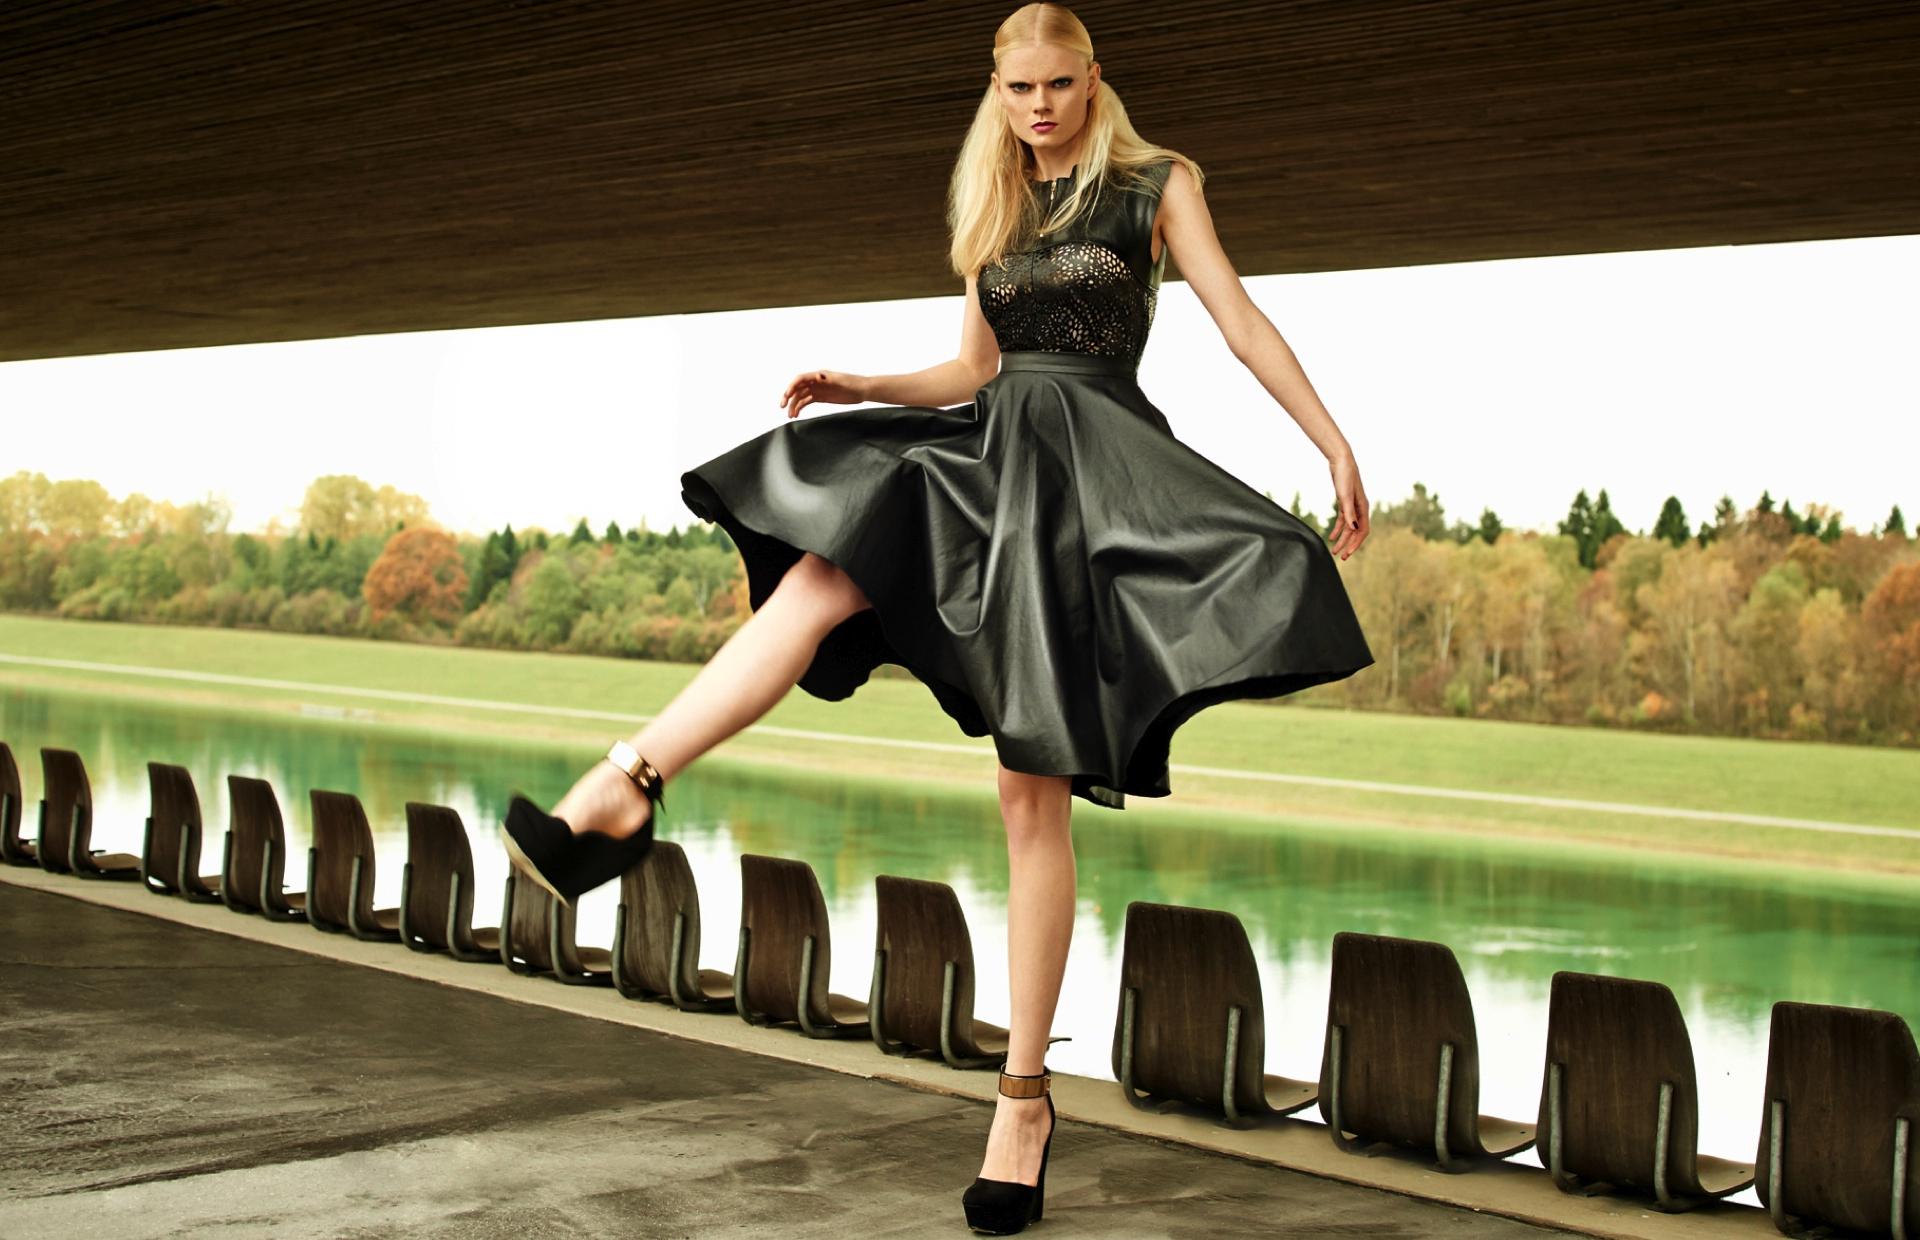 Astrid M. Obert Photographie presents Emilie a number7even production